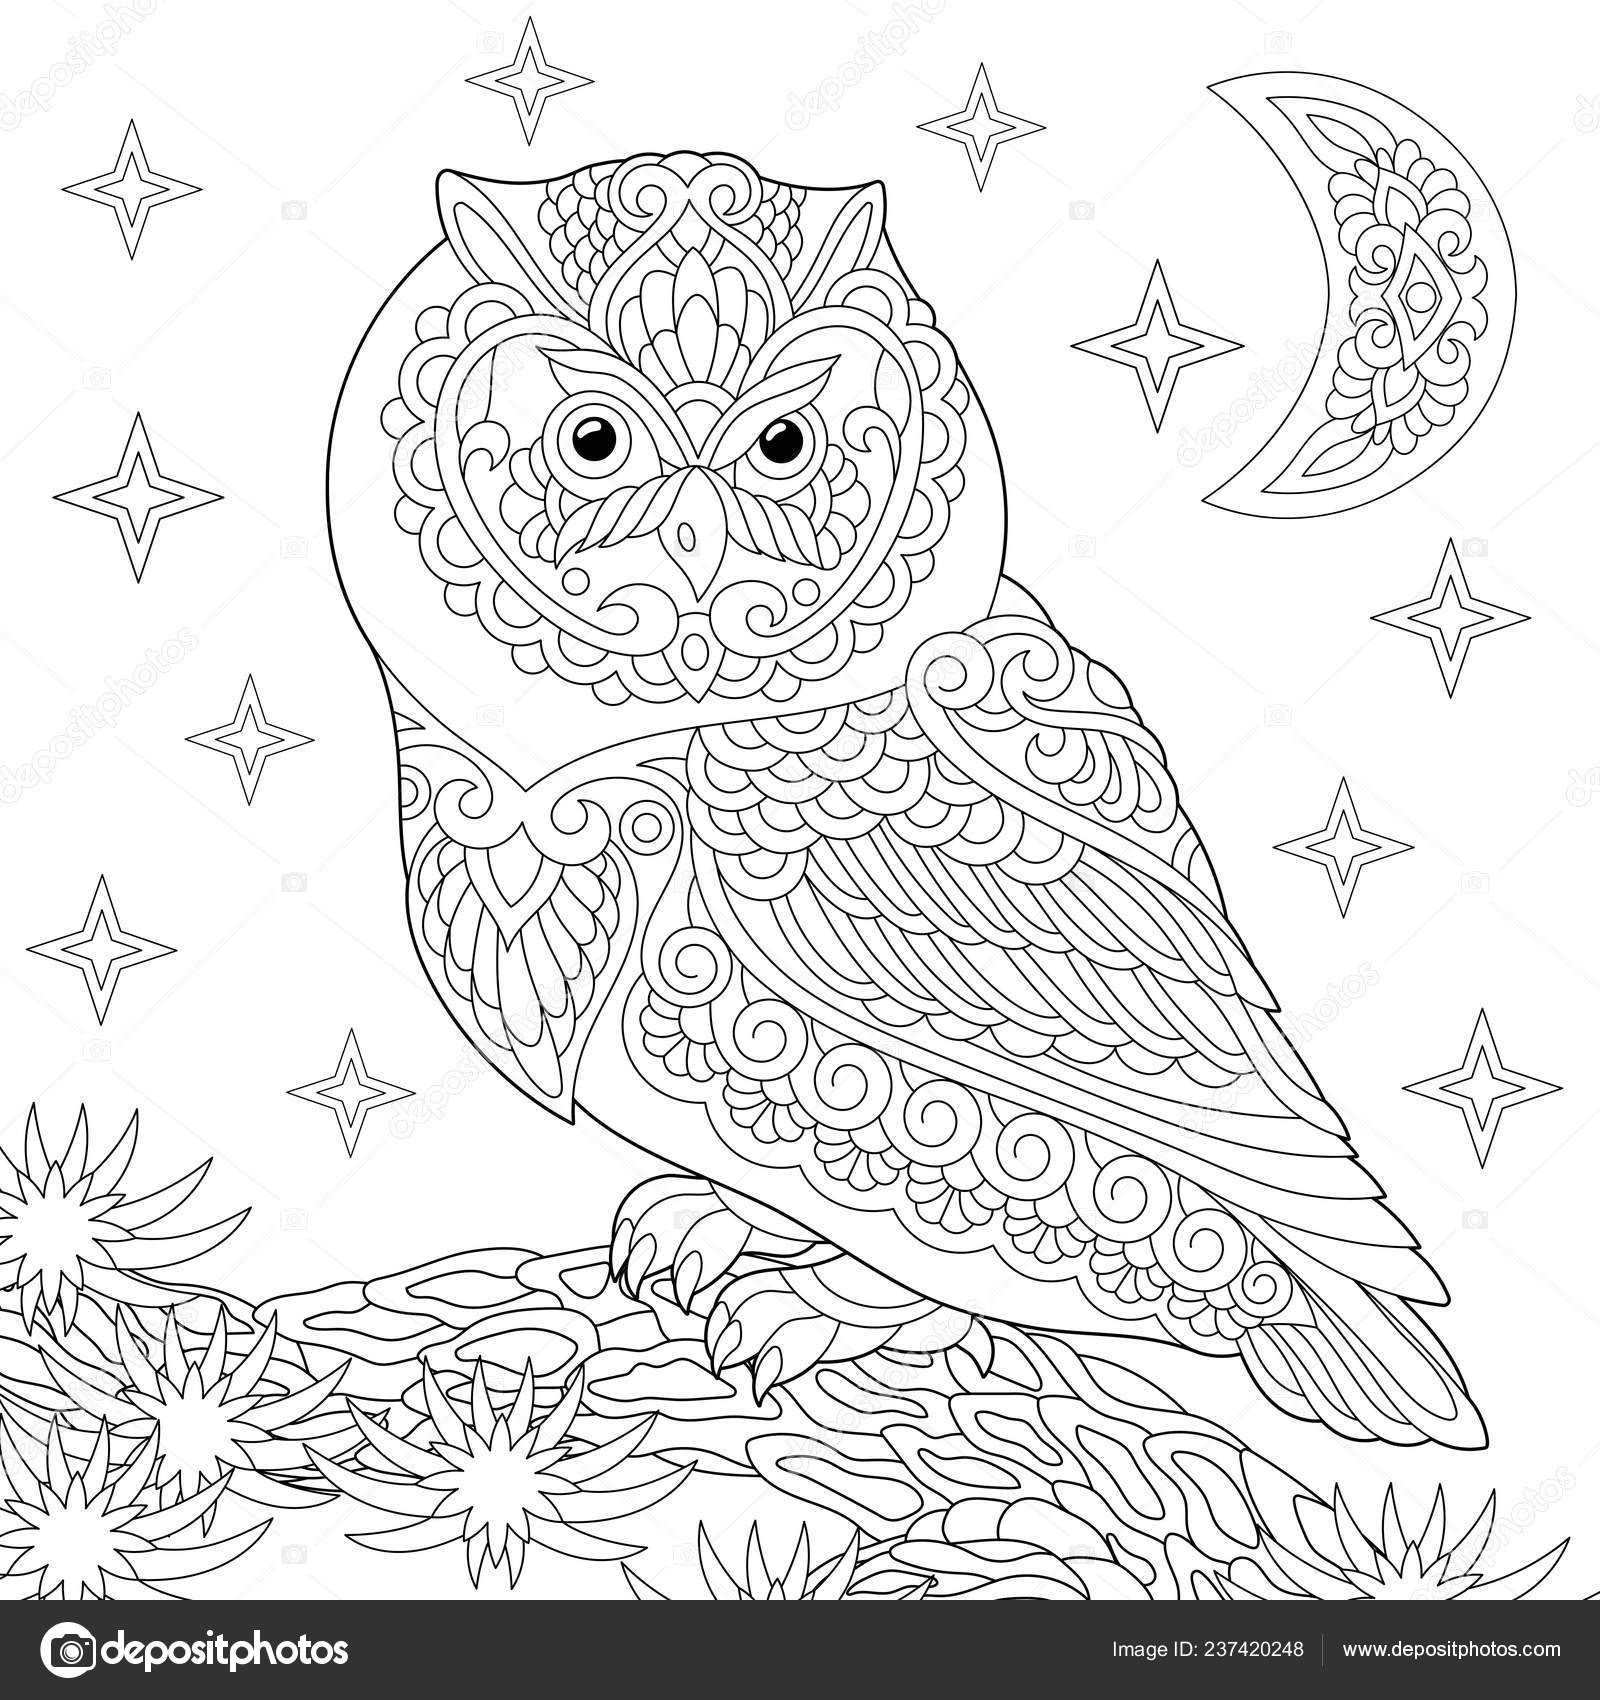 Coloriage Anti Stress Hibou.Coloriage Livre Coloriage Photo Coloriage Stress Avec Hibou